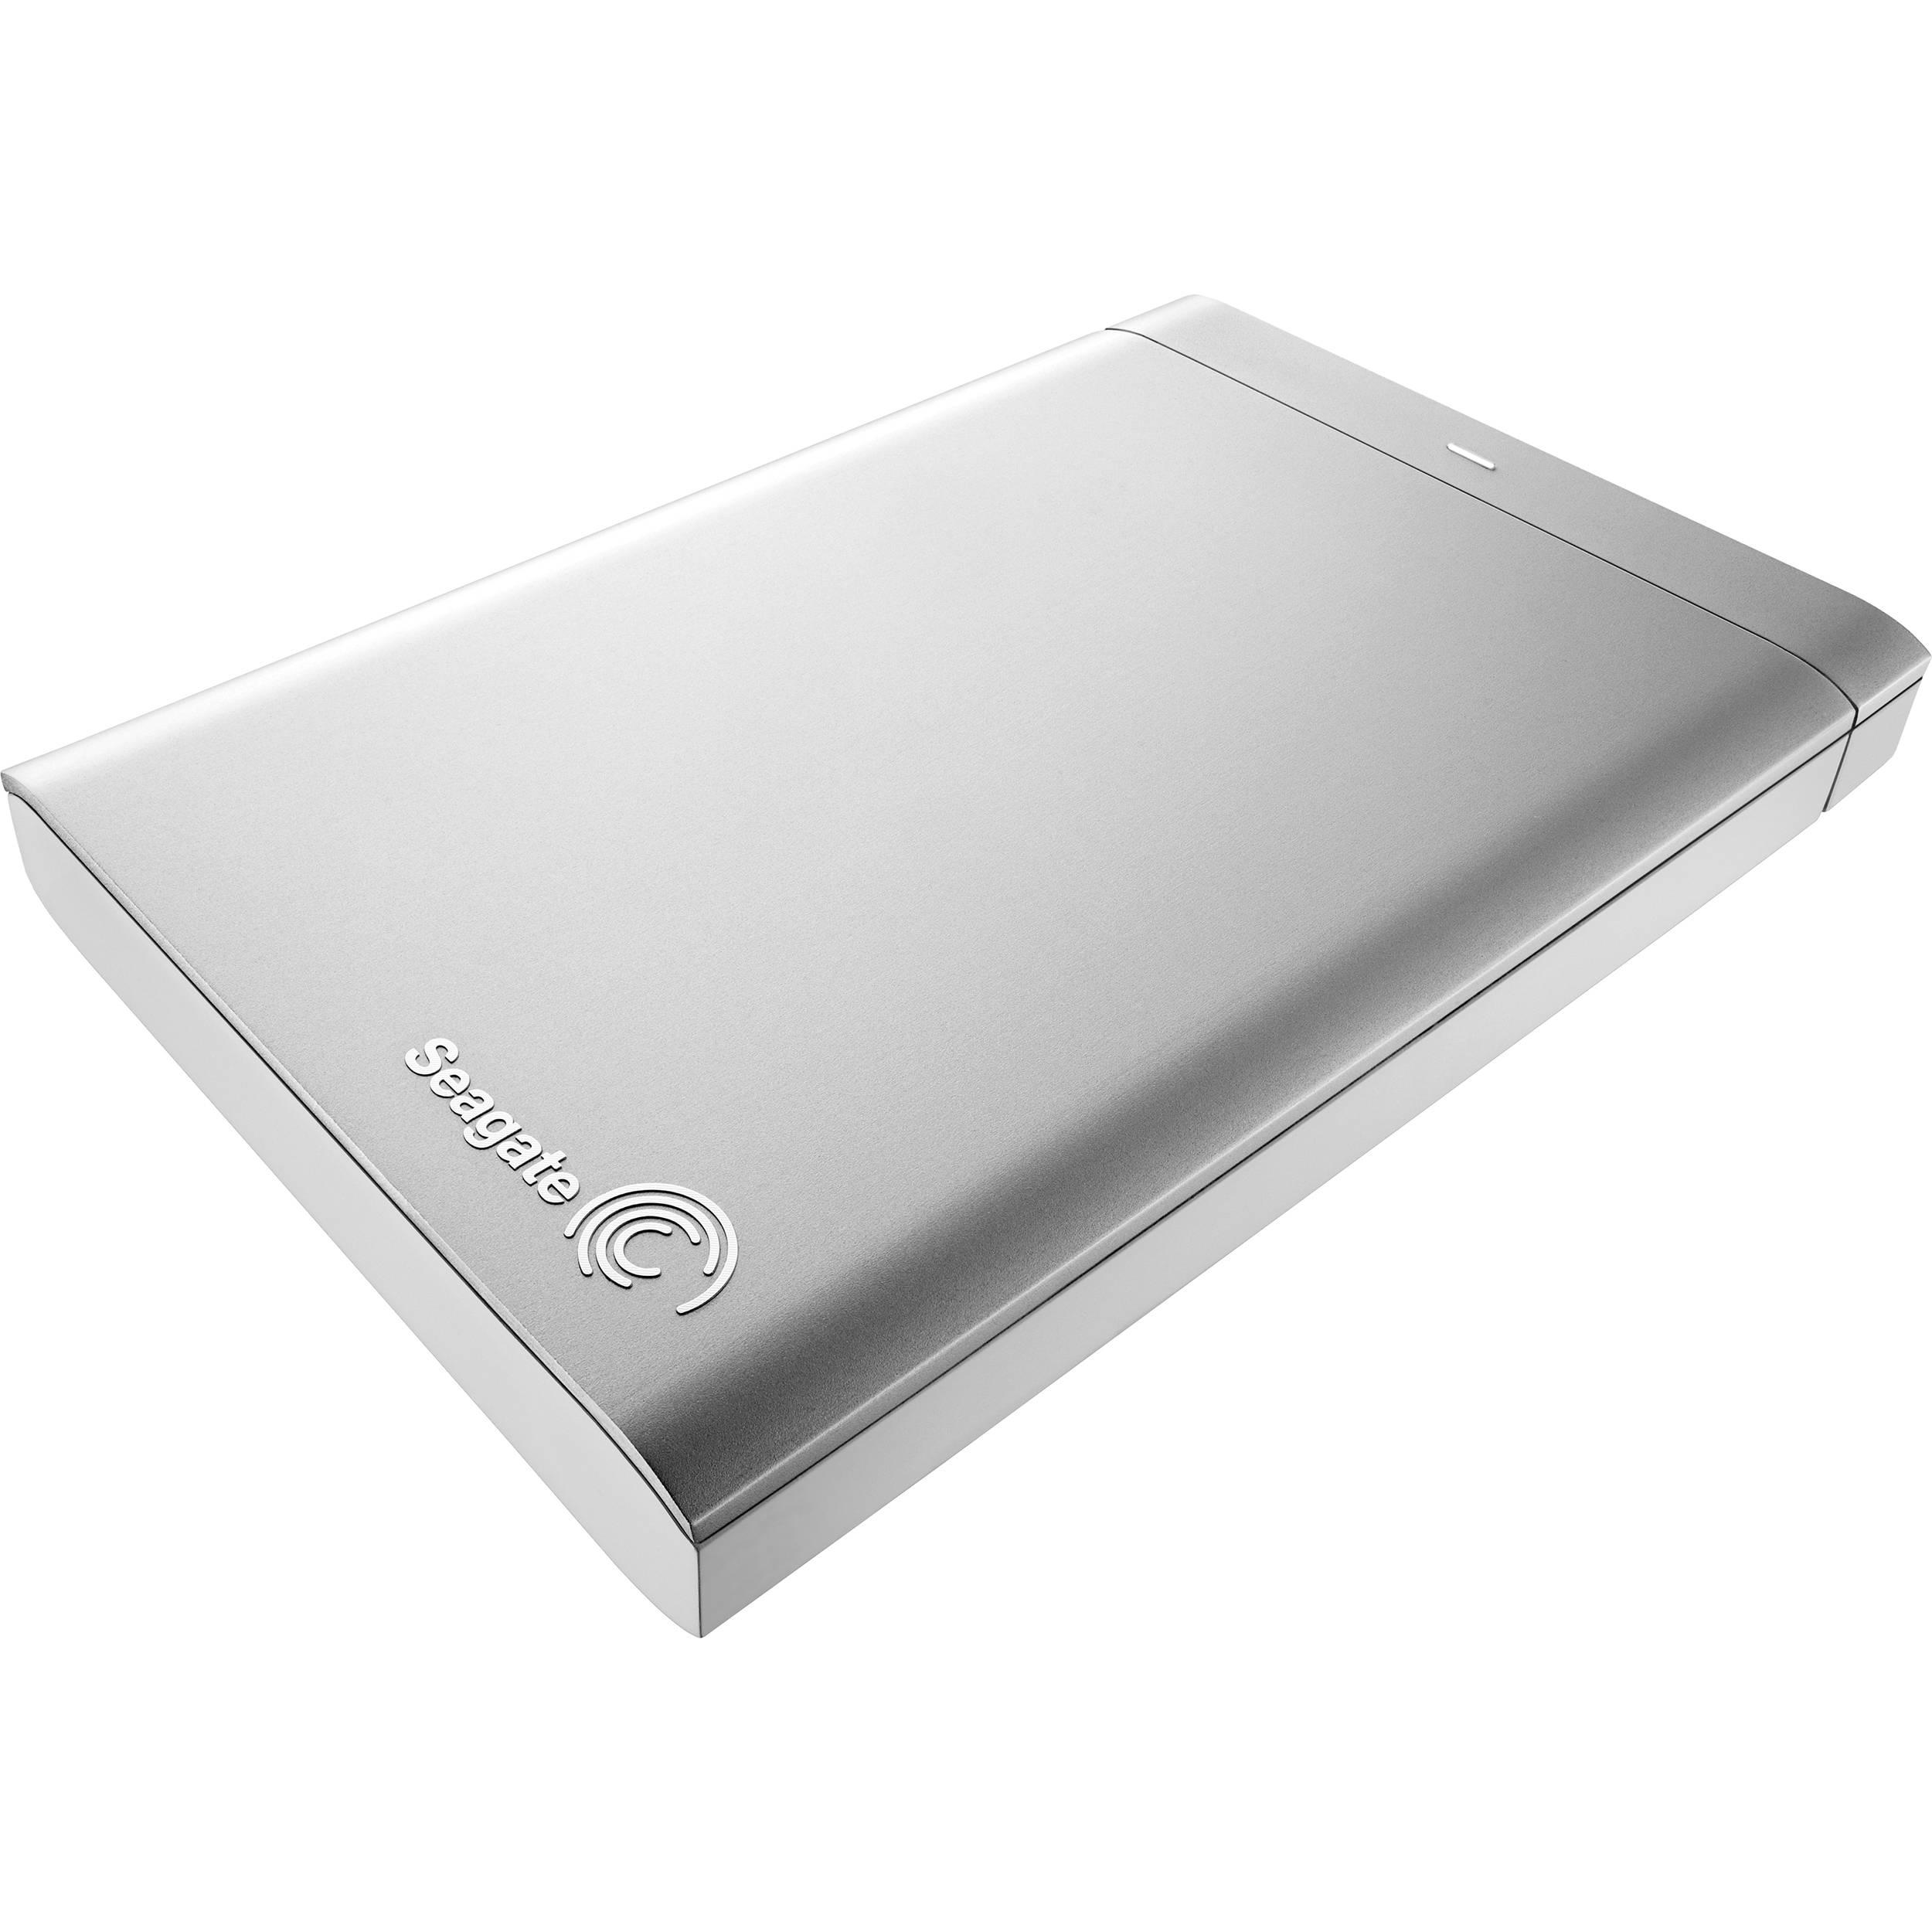 Seagate 1tb Usb 3 0 Backup Plus Portable Hard Drive Stbw1000900